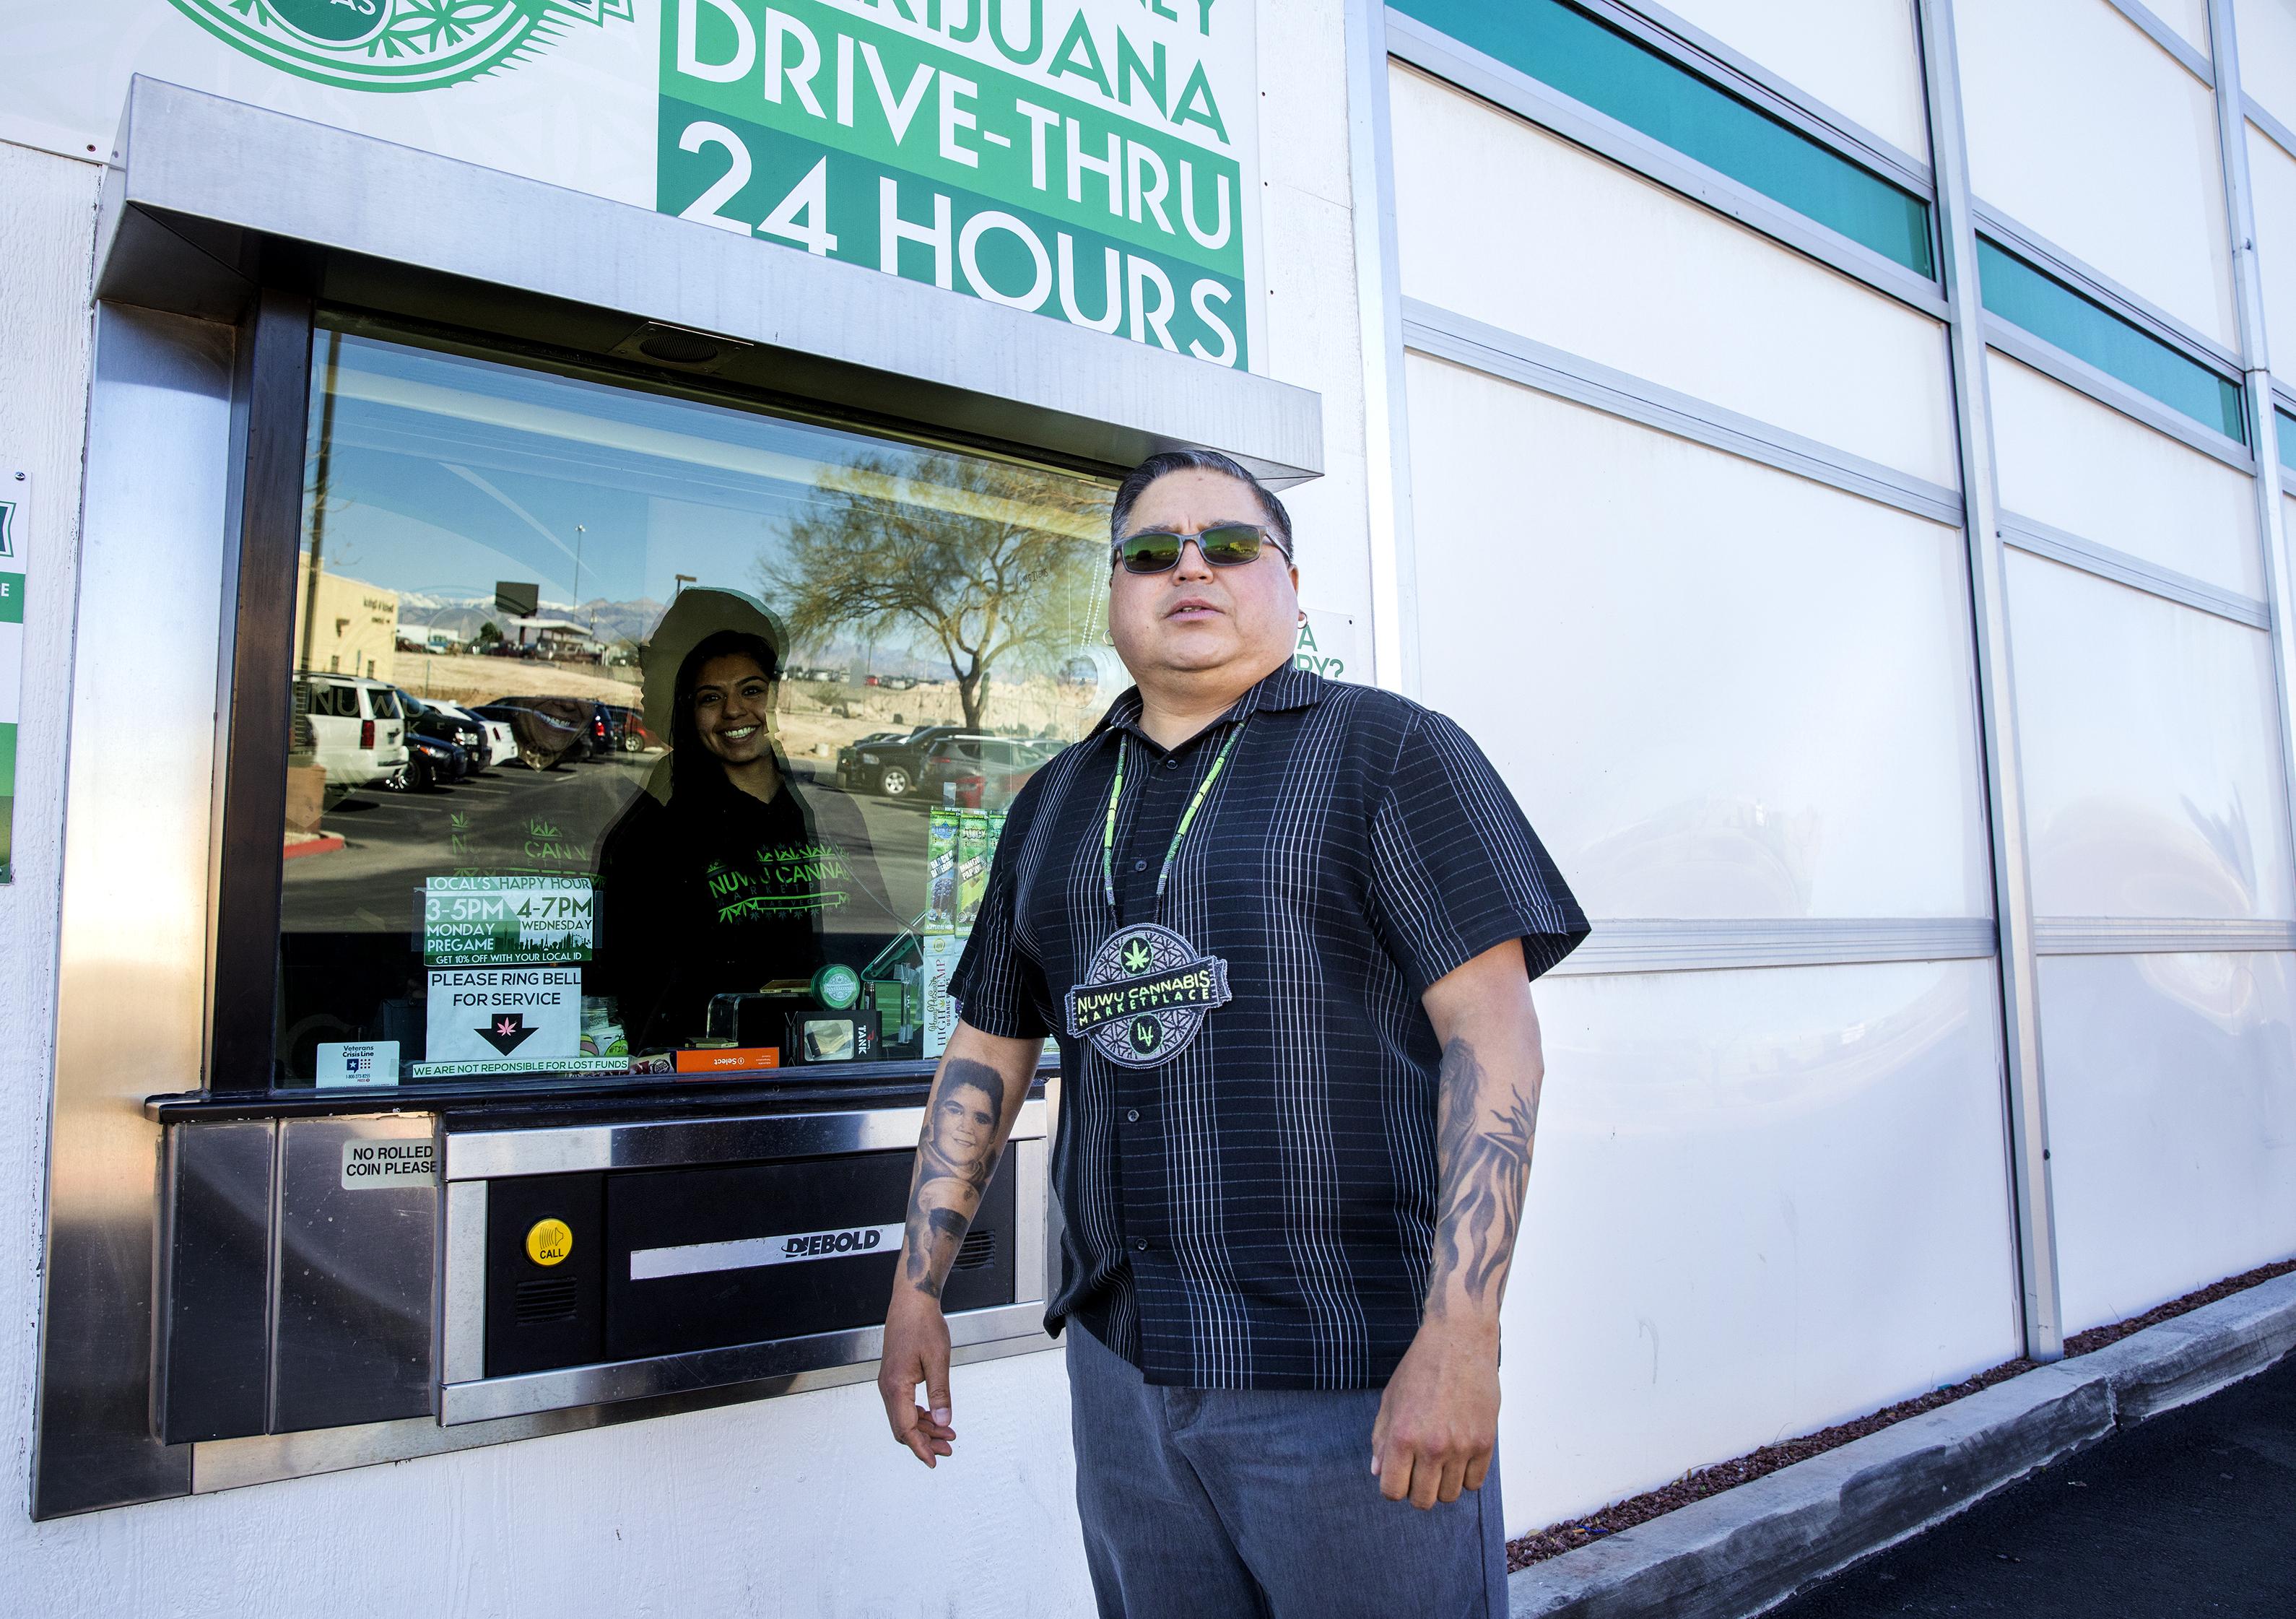 Las Vegas Paiutes thrive in legalized marijuana market